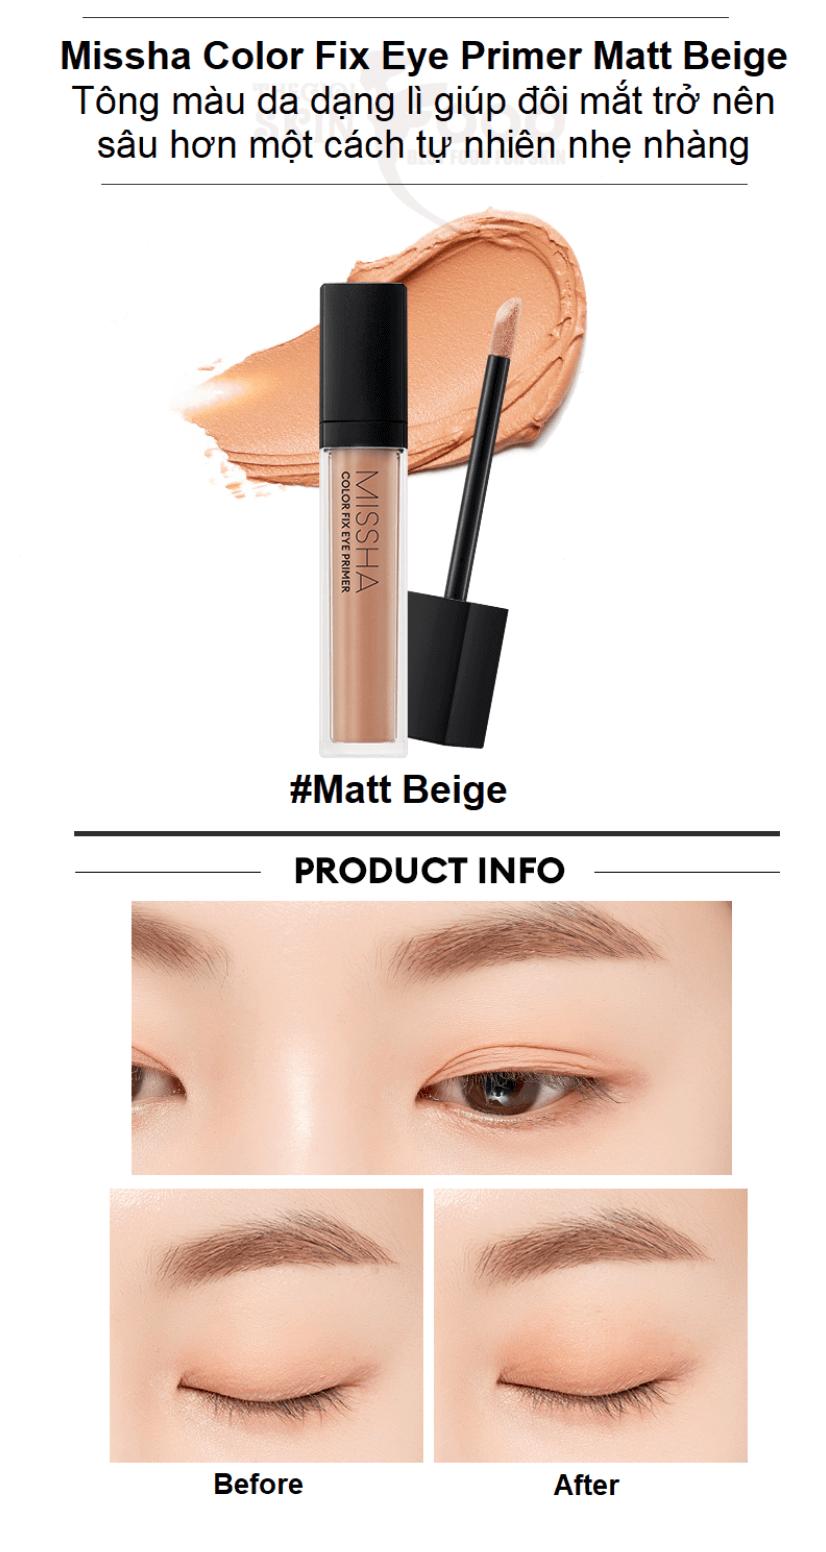 kem-lot-danh-cho-mat-missha-color-fix-eye-primer